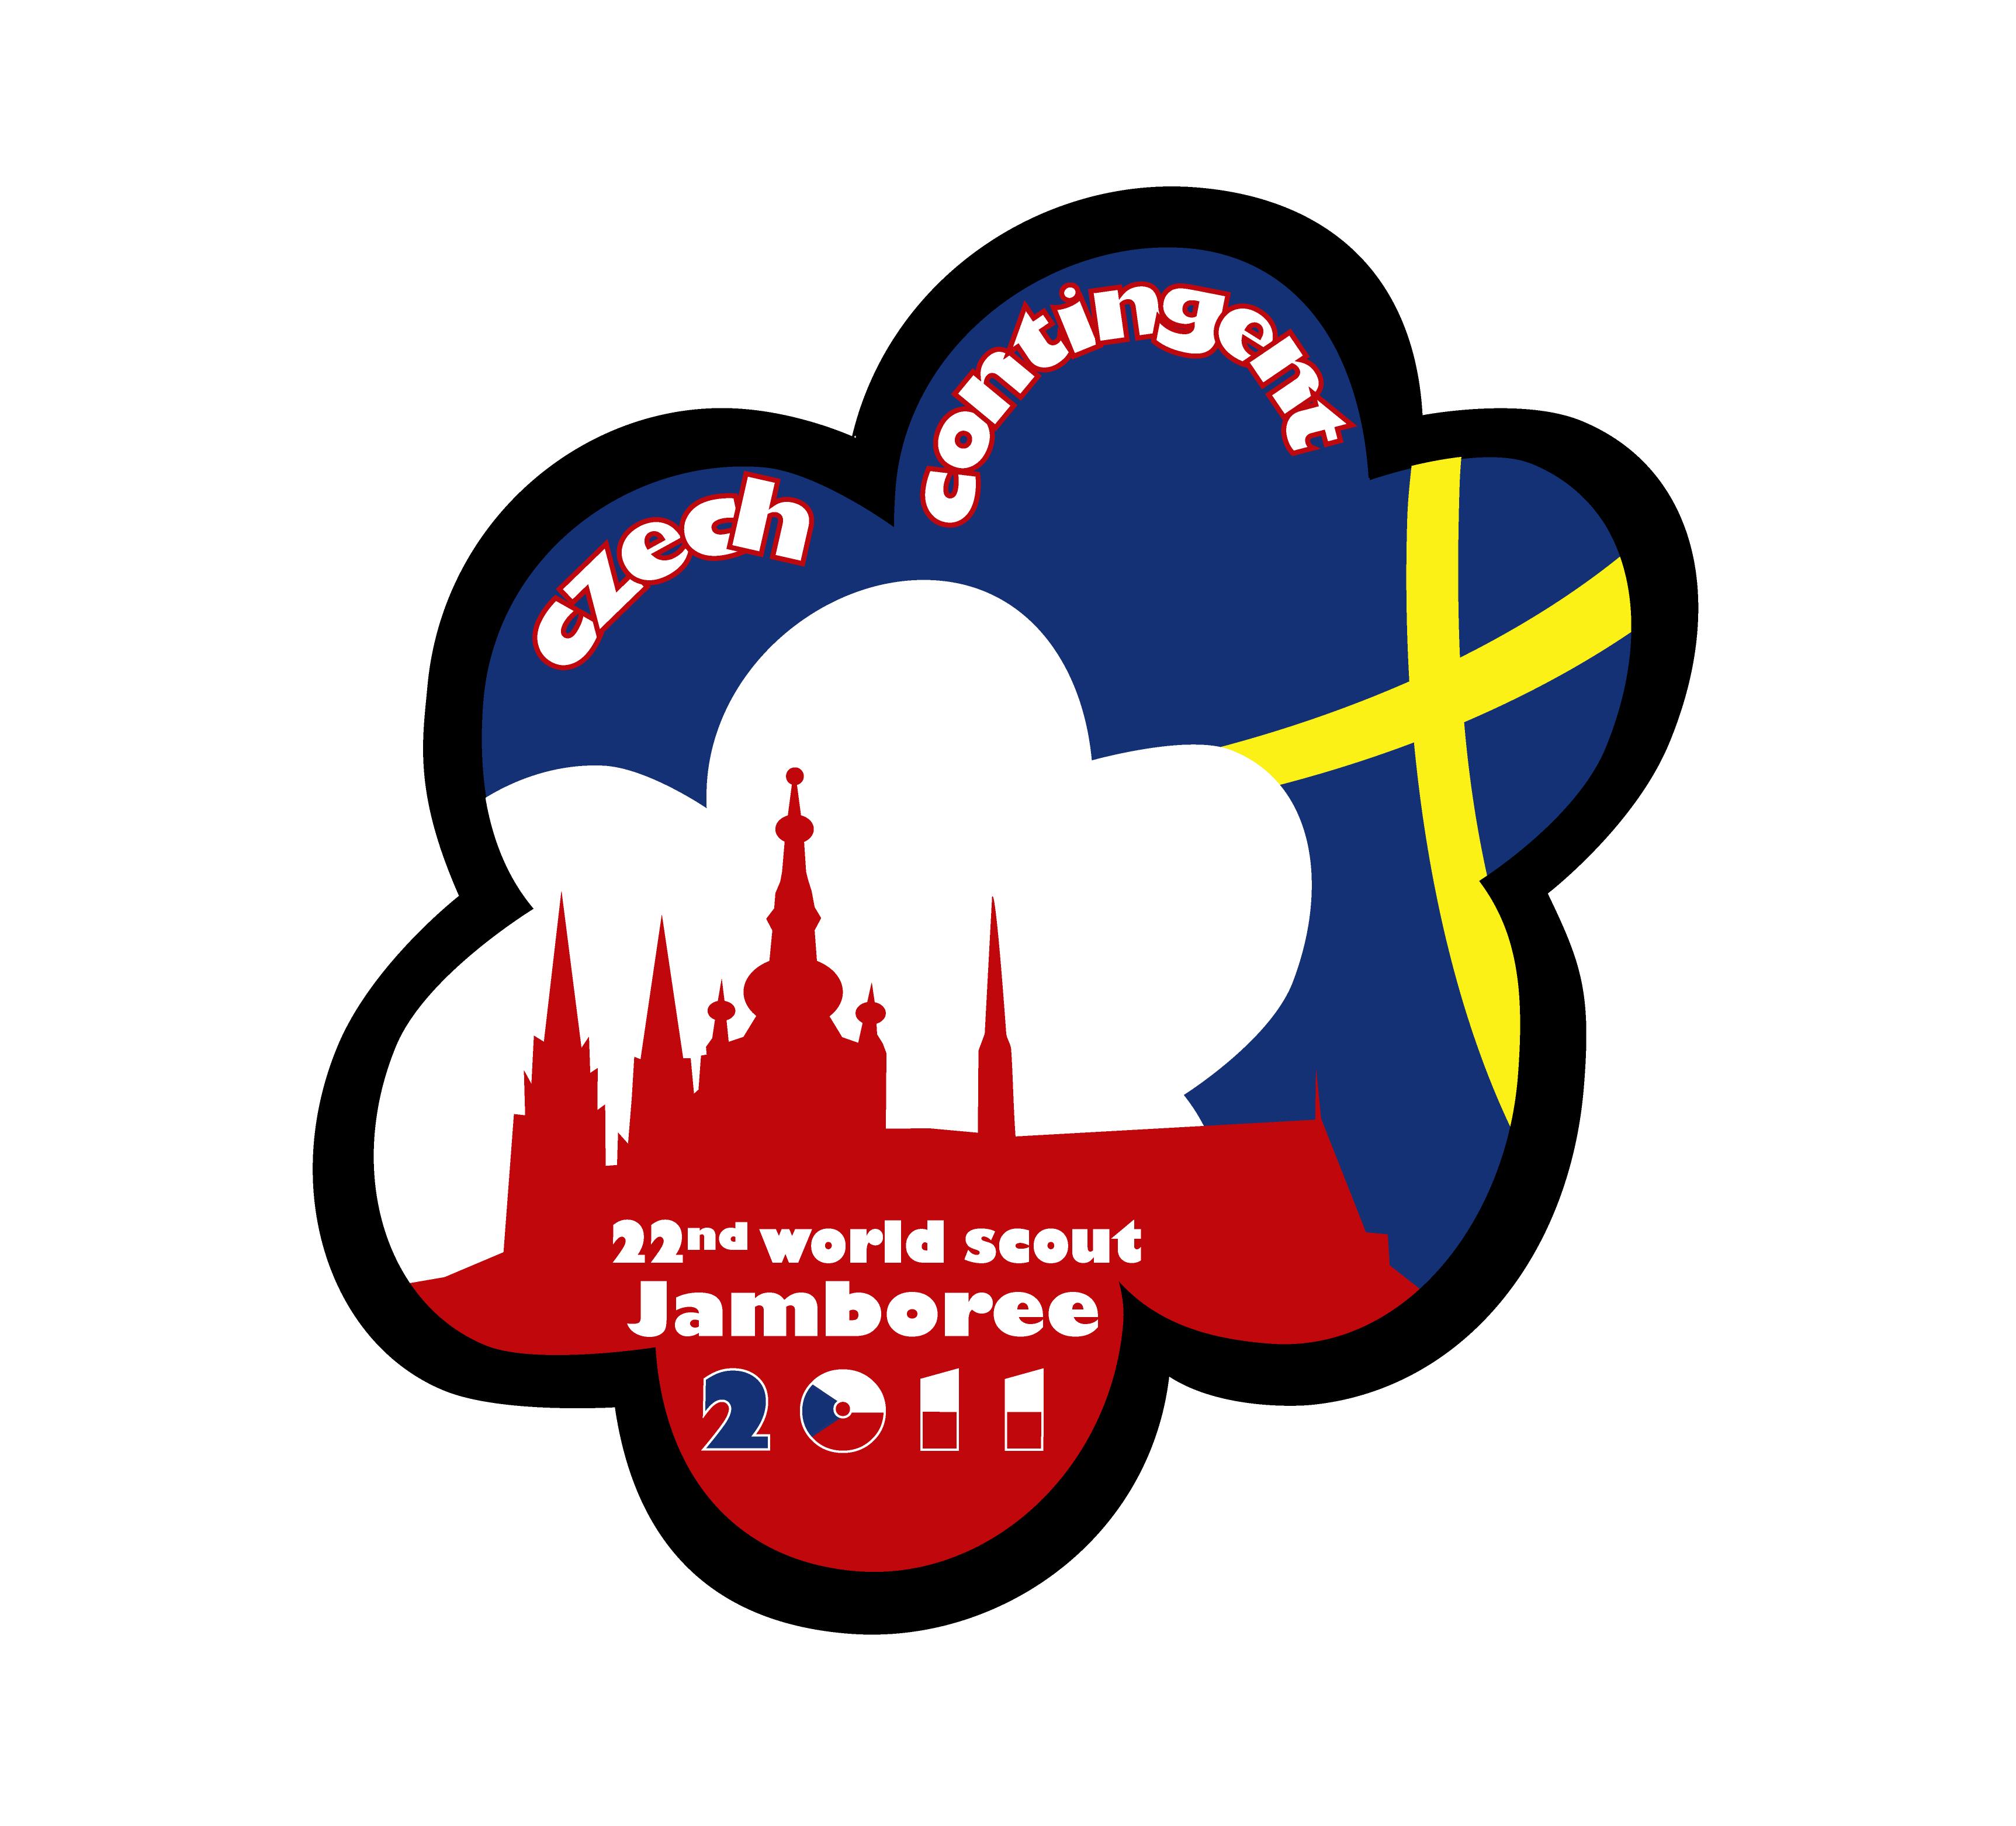 http://vodni.skauting.cz/upload/velbloud/Logo_jamboree.PNG